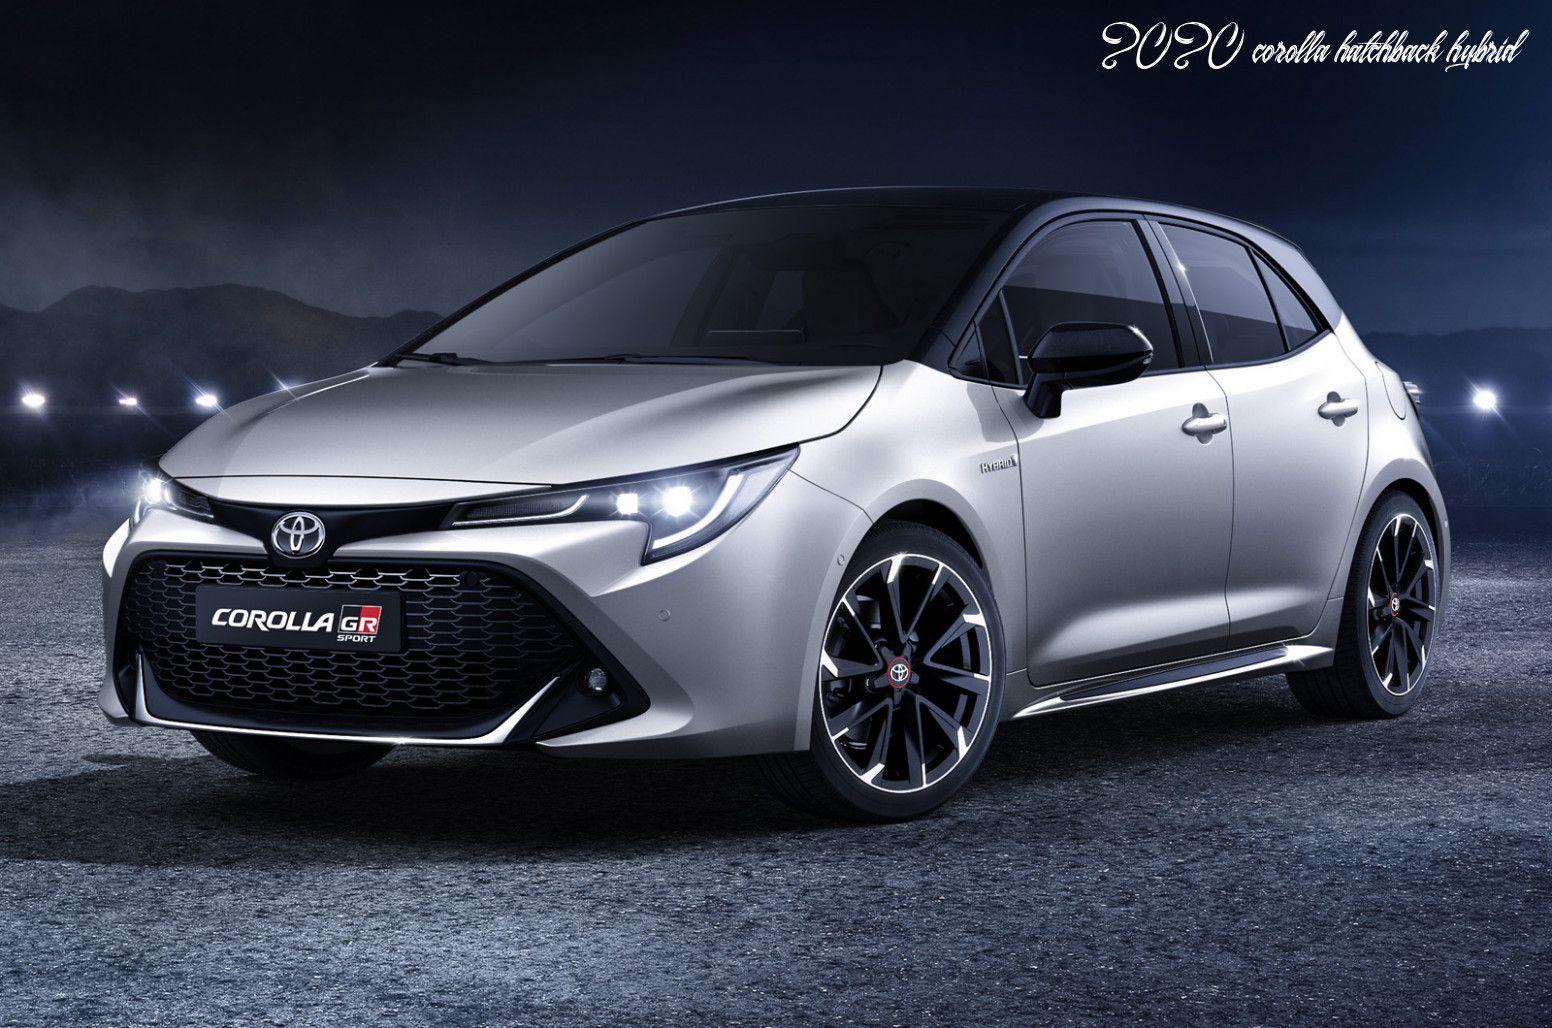 2020 Corolla Hatchback Hybrid In 2020 Toyota Corolla Sport Toyota Corolla Hatchback Toyota Corolla